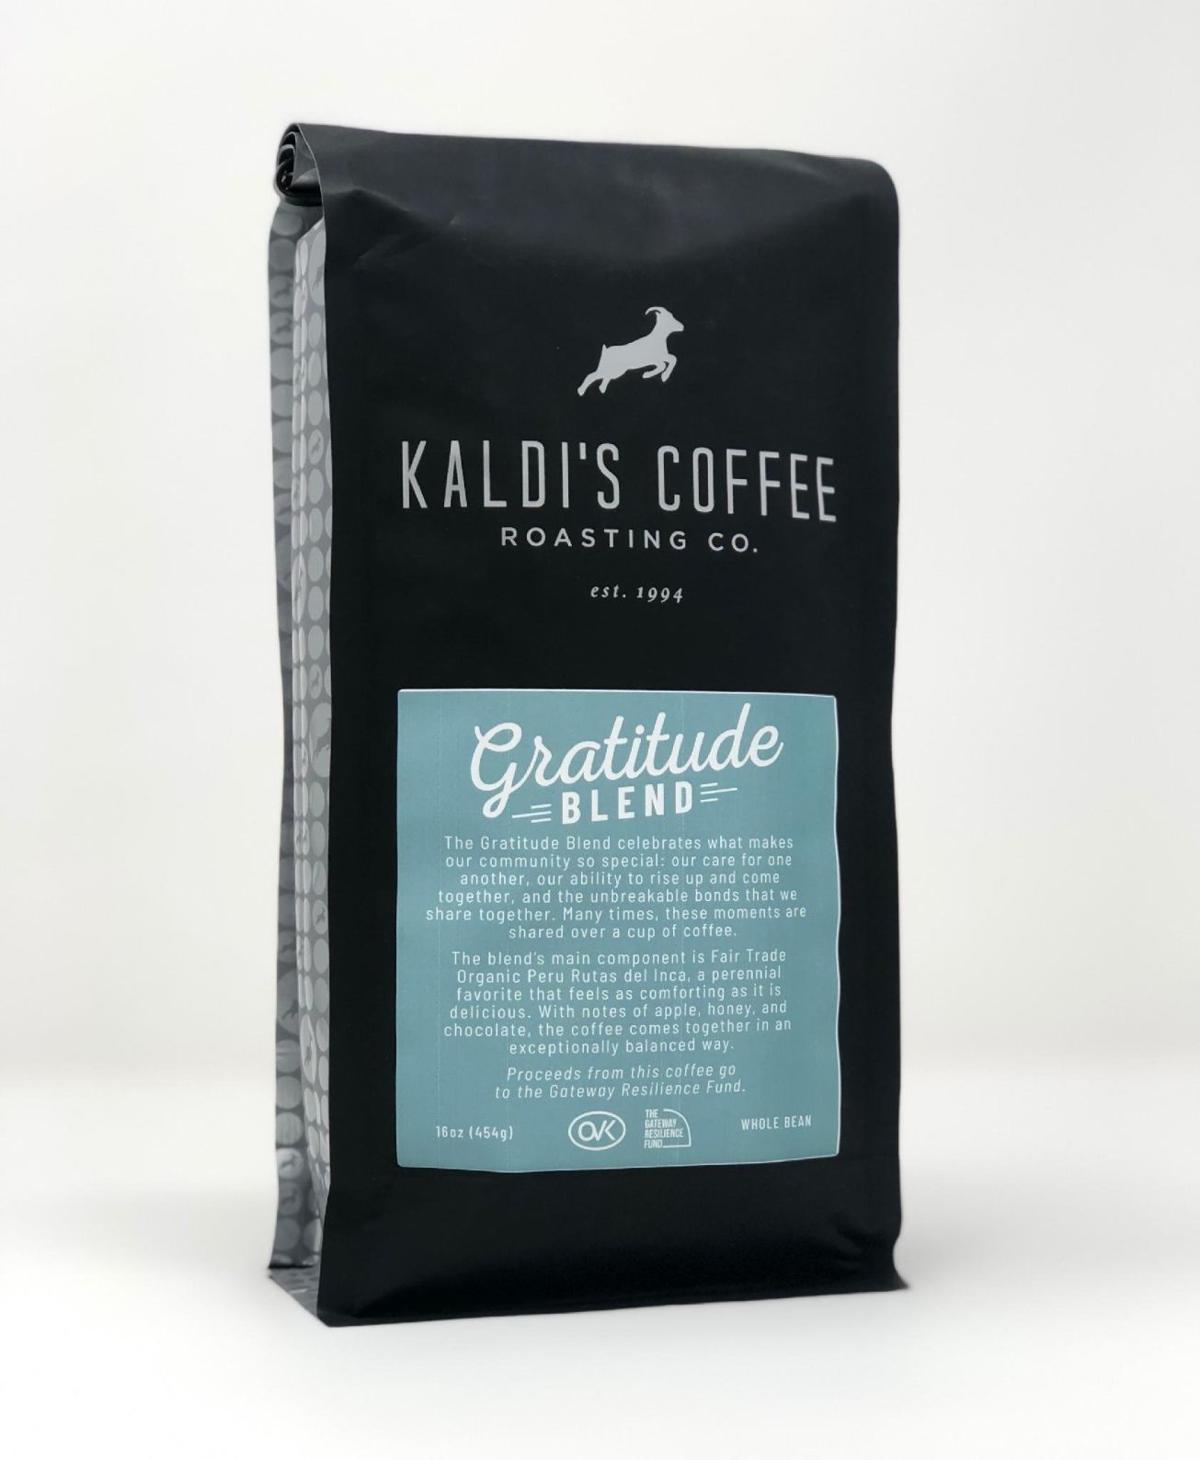 Kaldi's Gratitude coffee